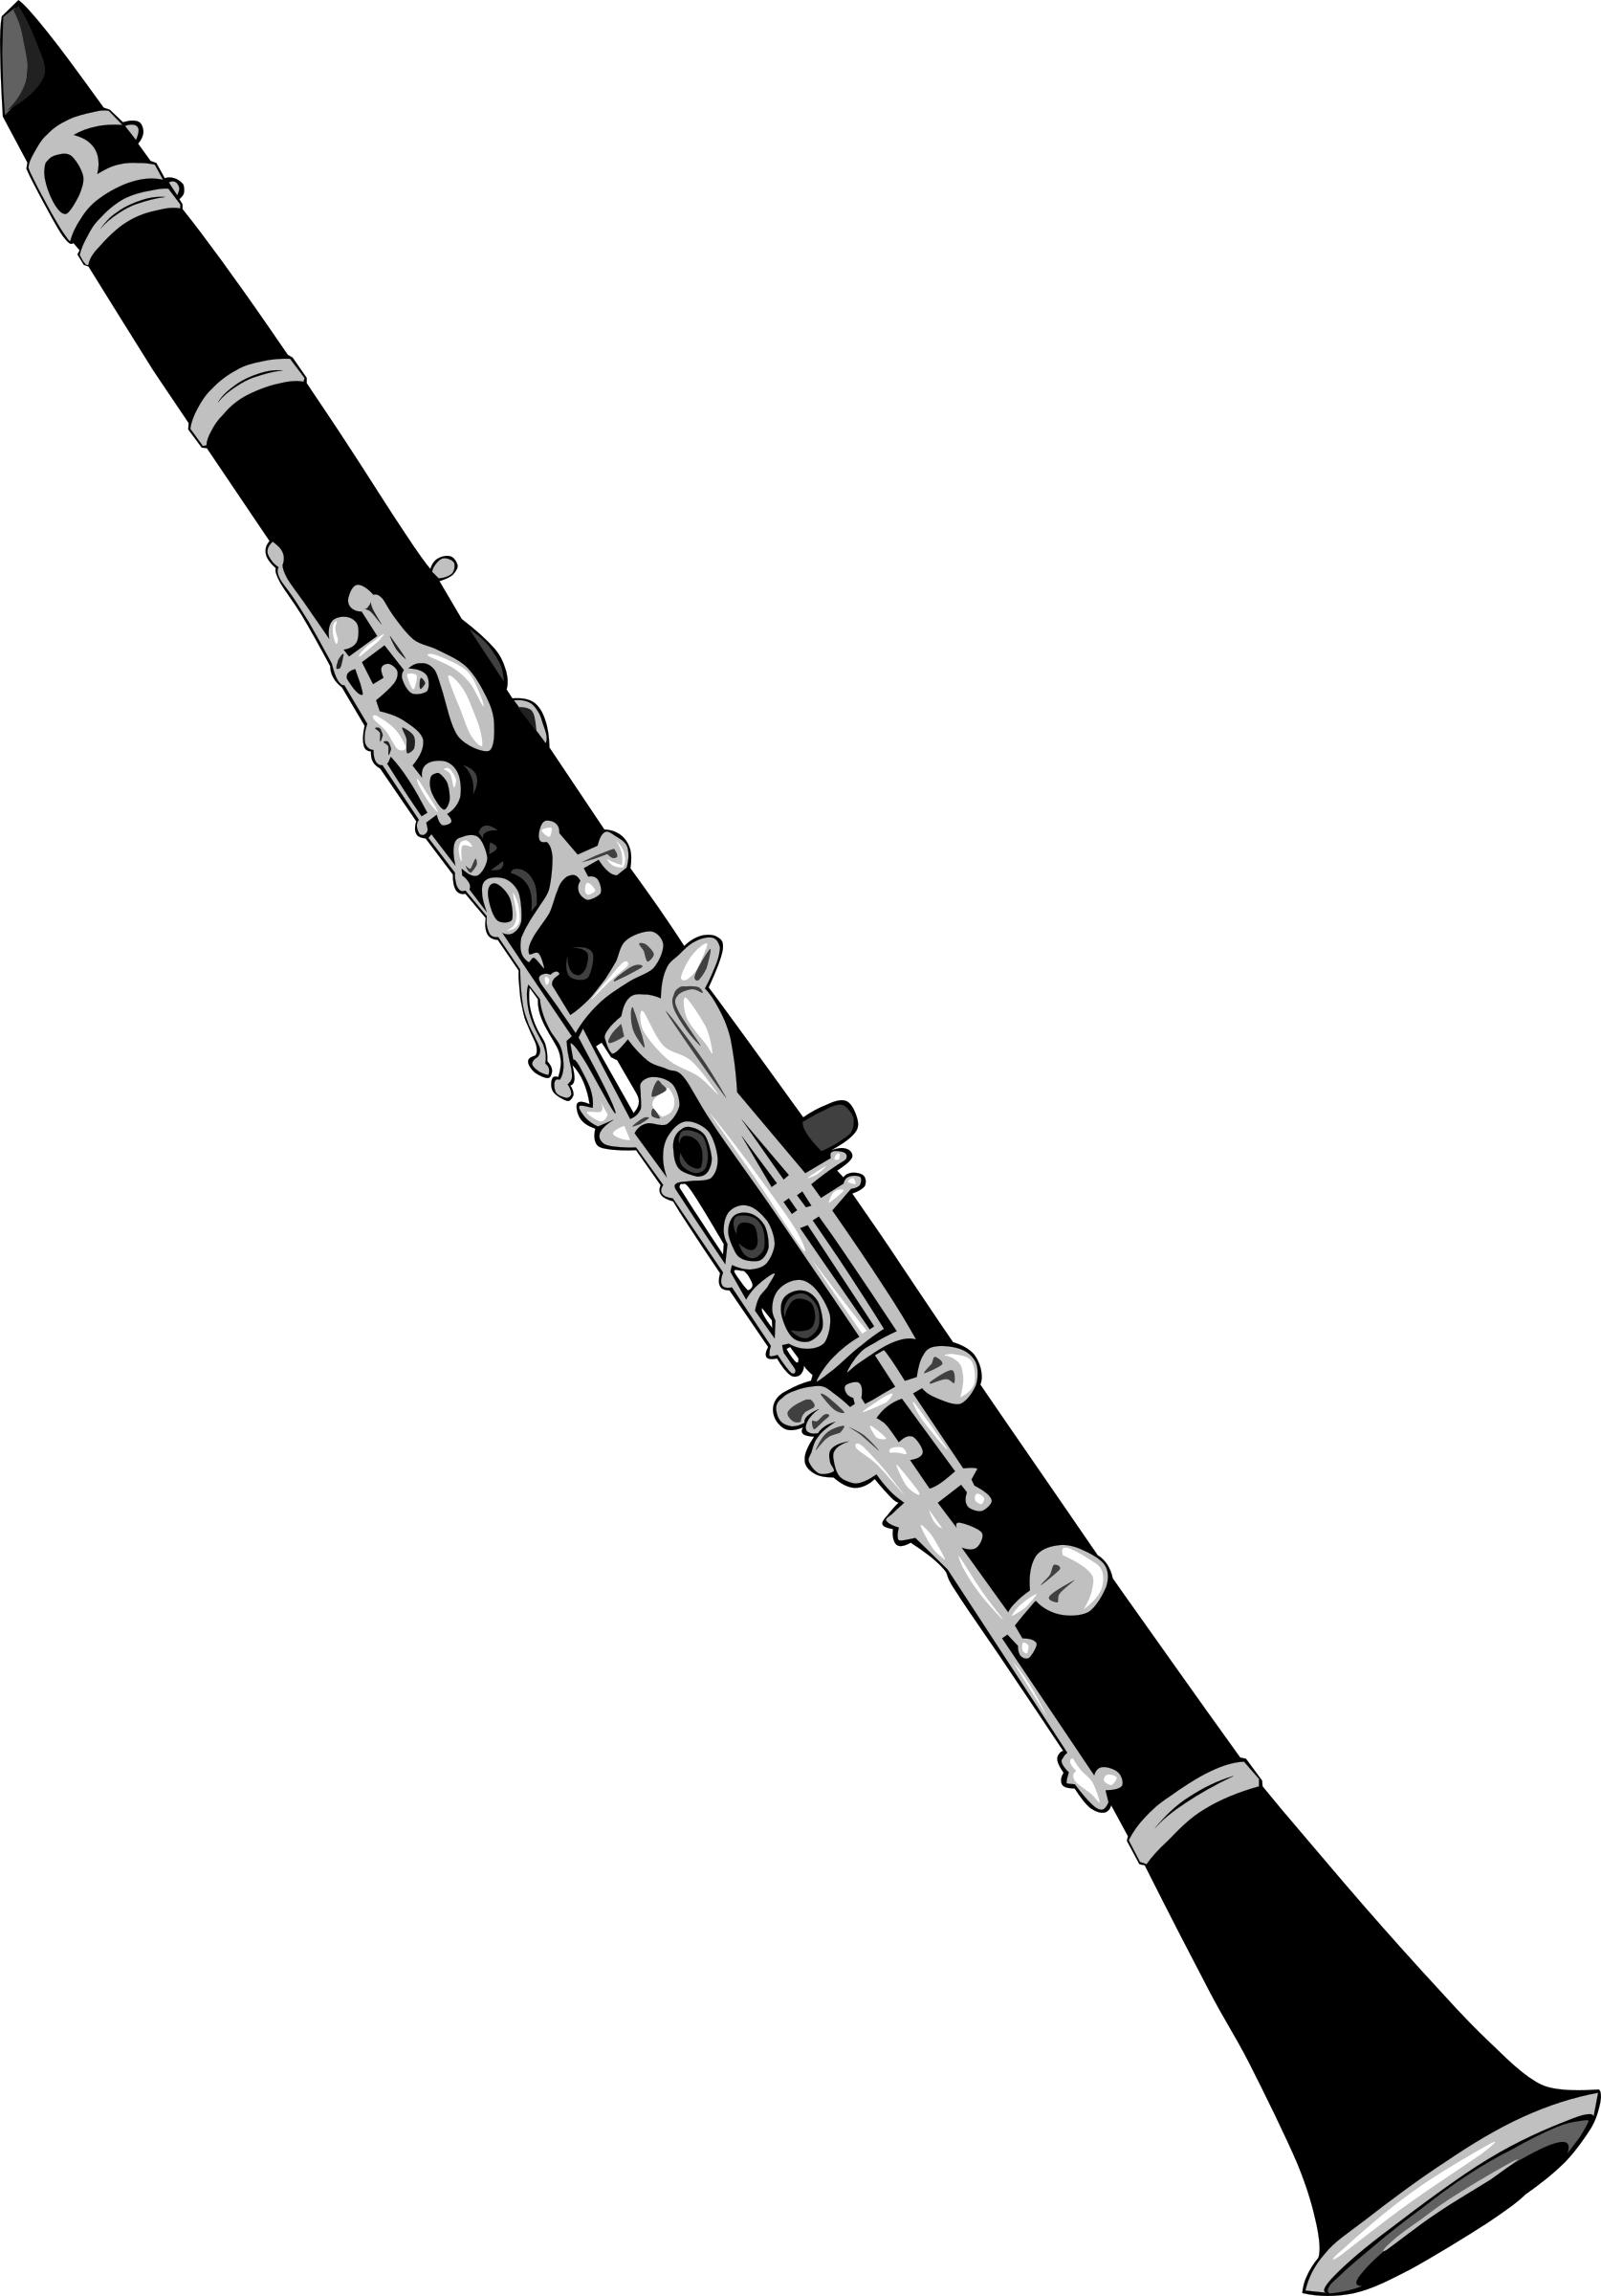 Clarinet clipart small